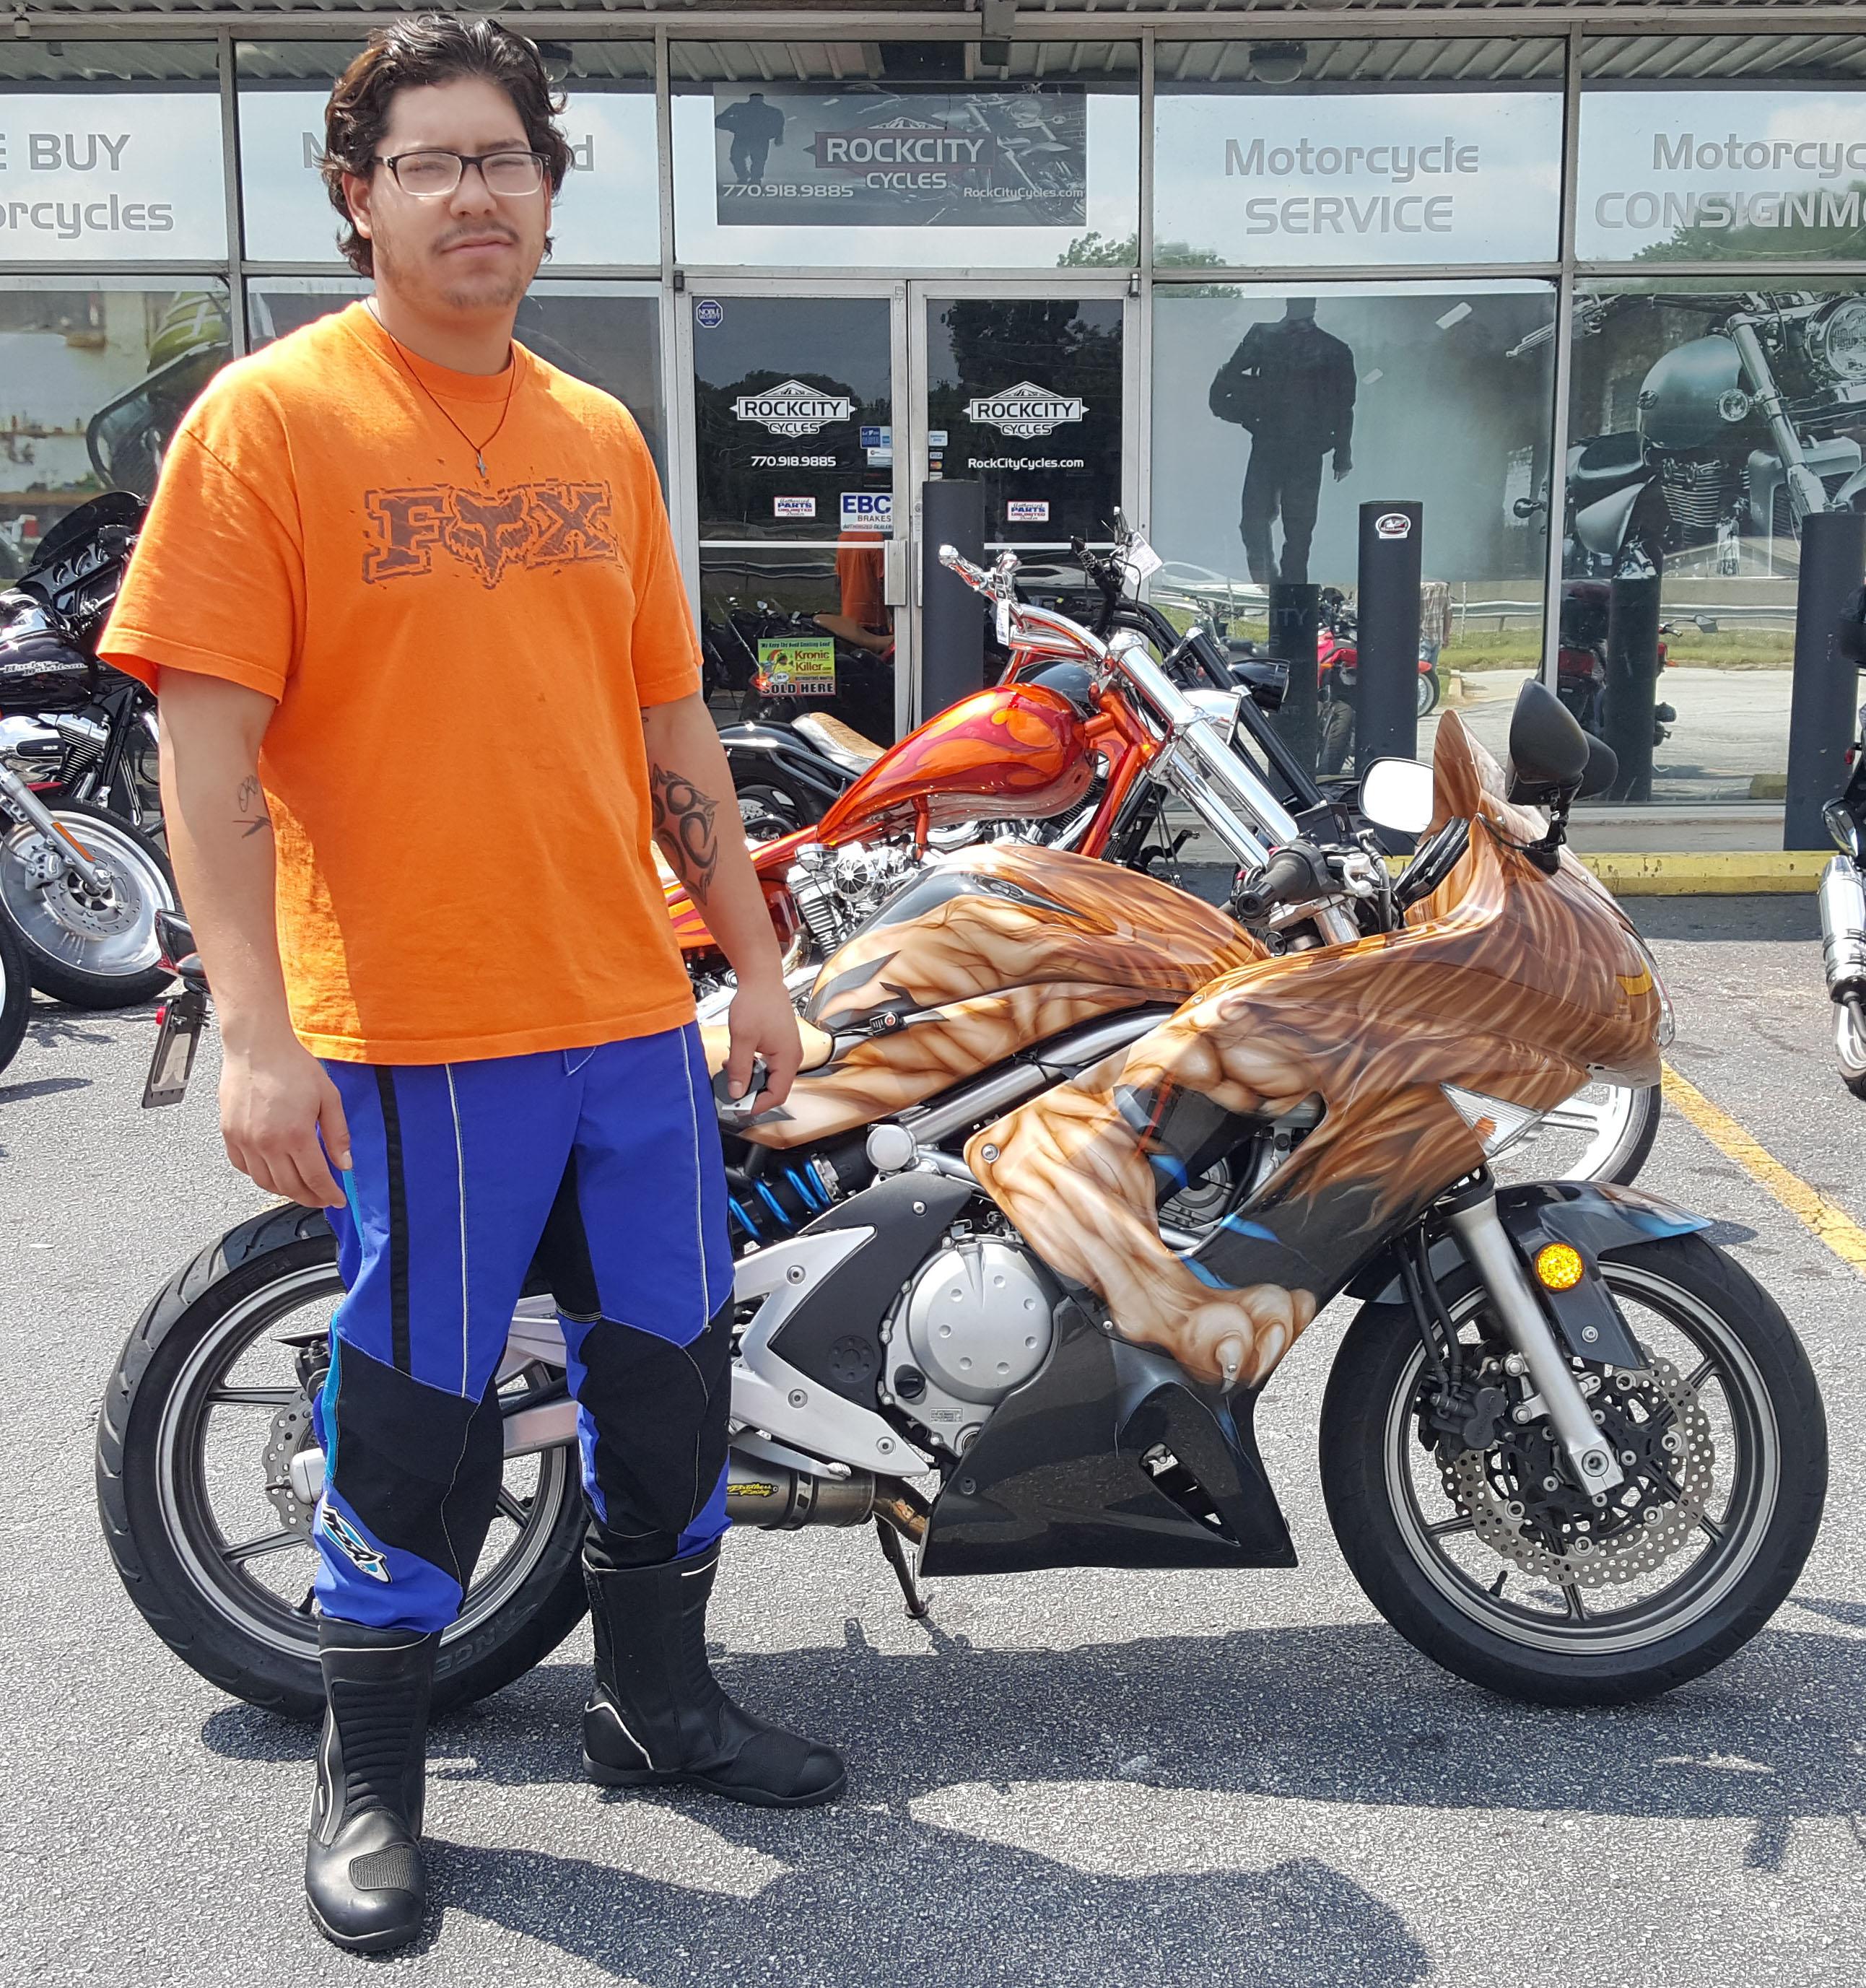 Erick J. with his 2007 Kawasaki Ninja EX650R